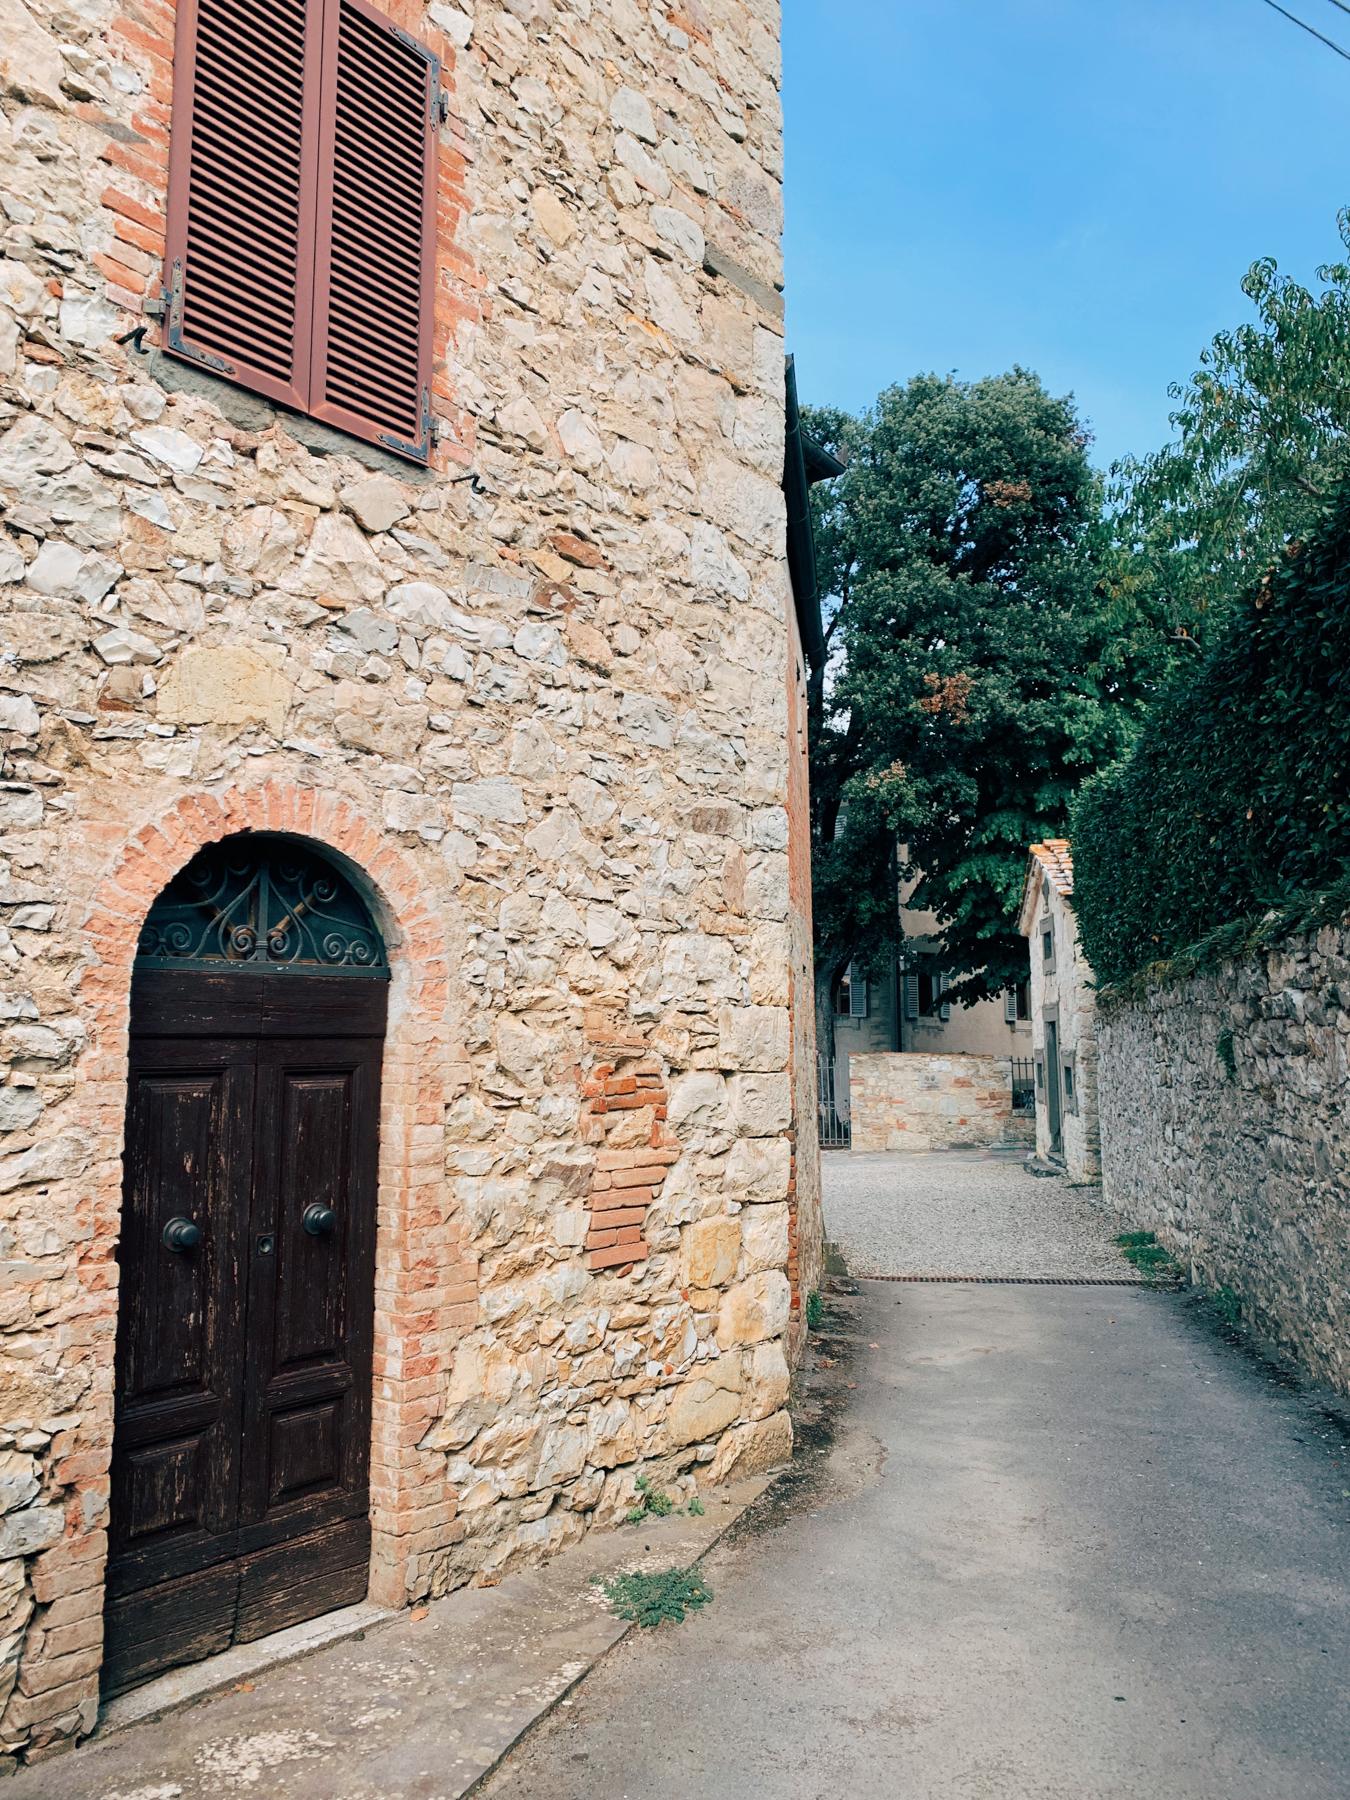 The grounds at Castello di Ama.